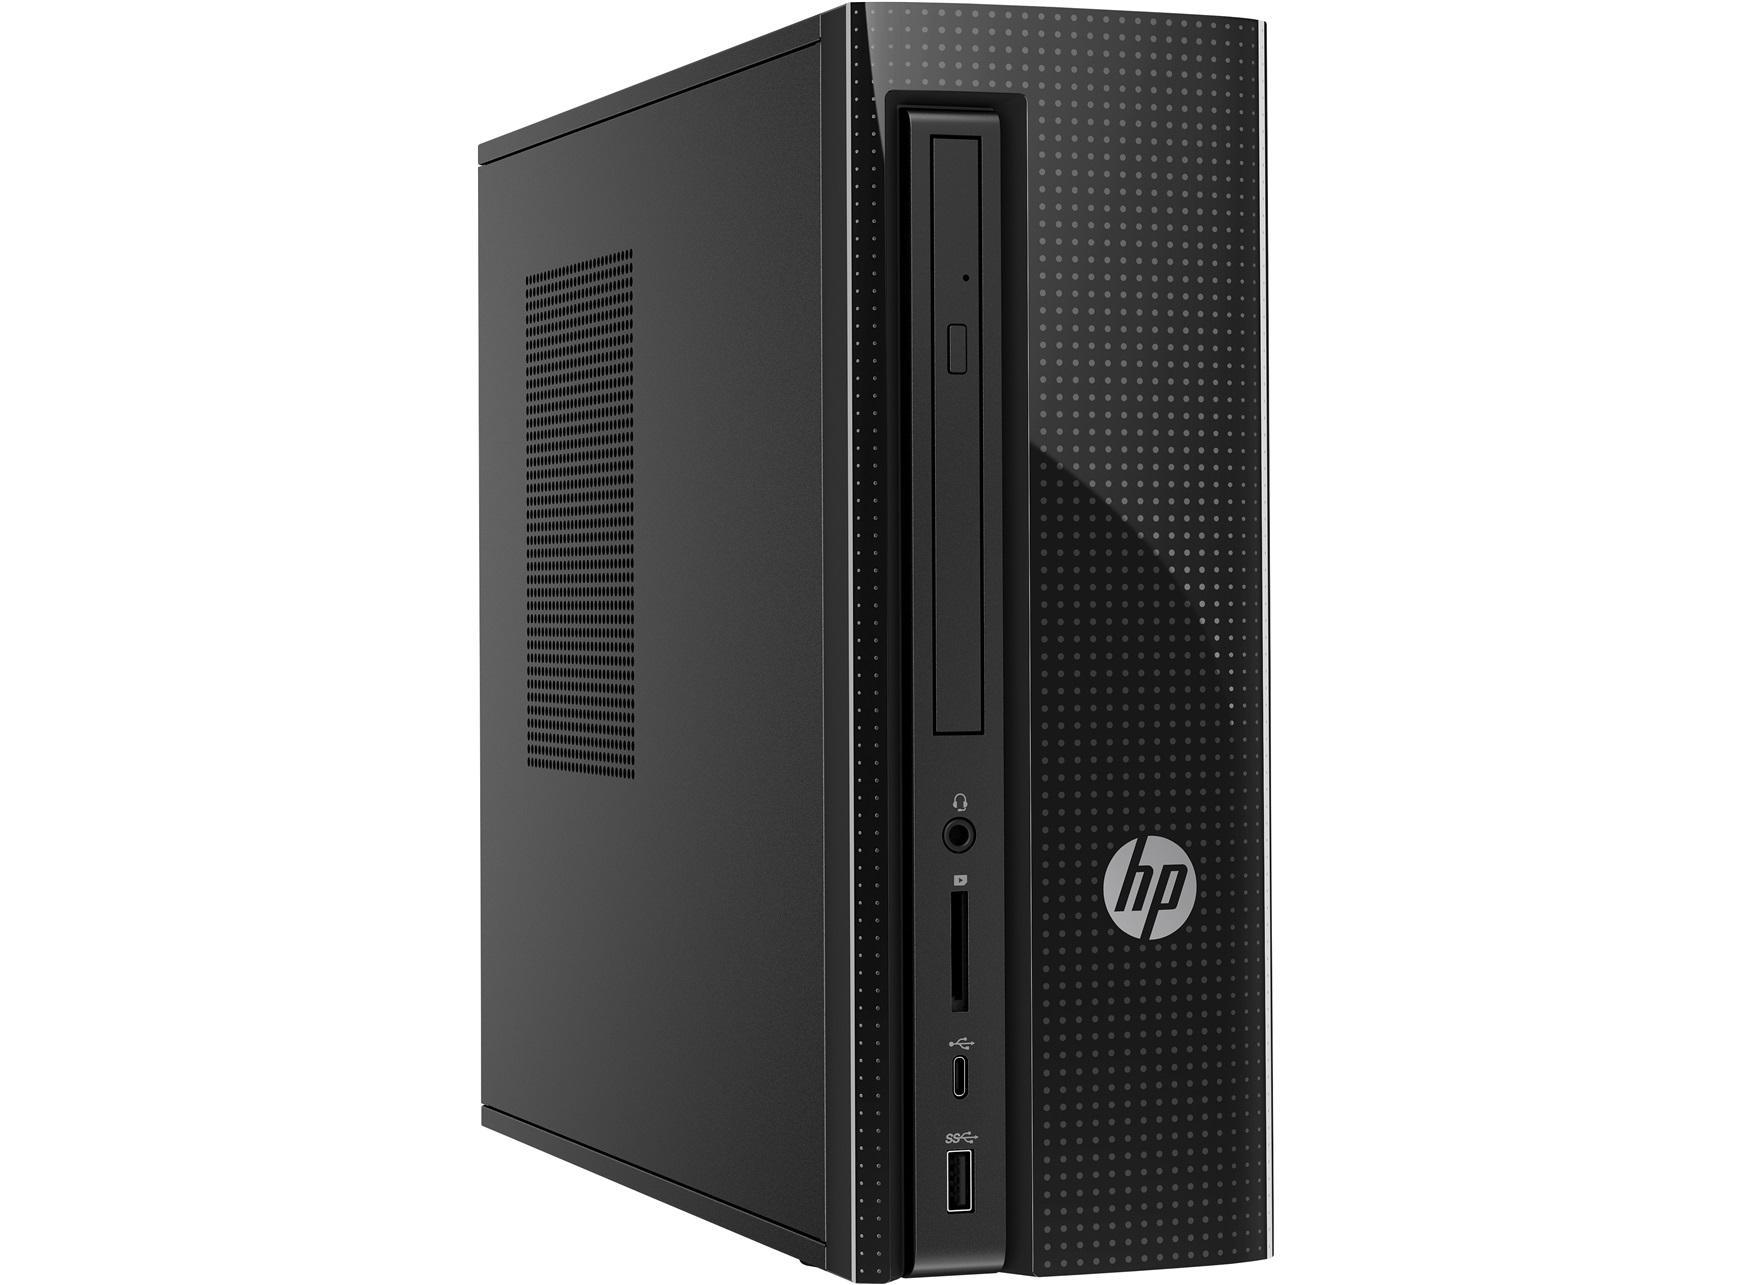 HP Pavilion 270-p026d Intel® Core i5-7400T Kabylake Slim Line Desktop (Win 10) (New)